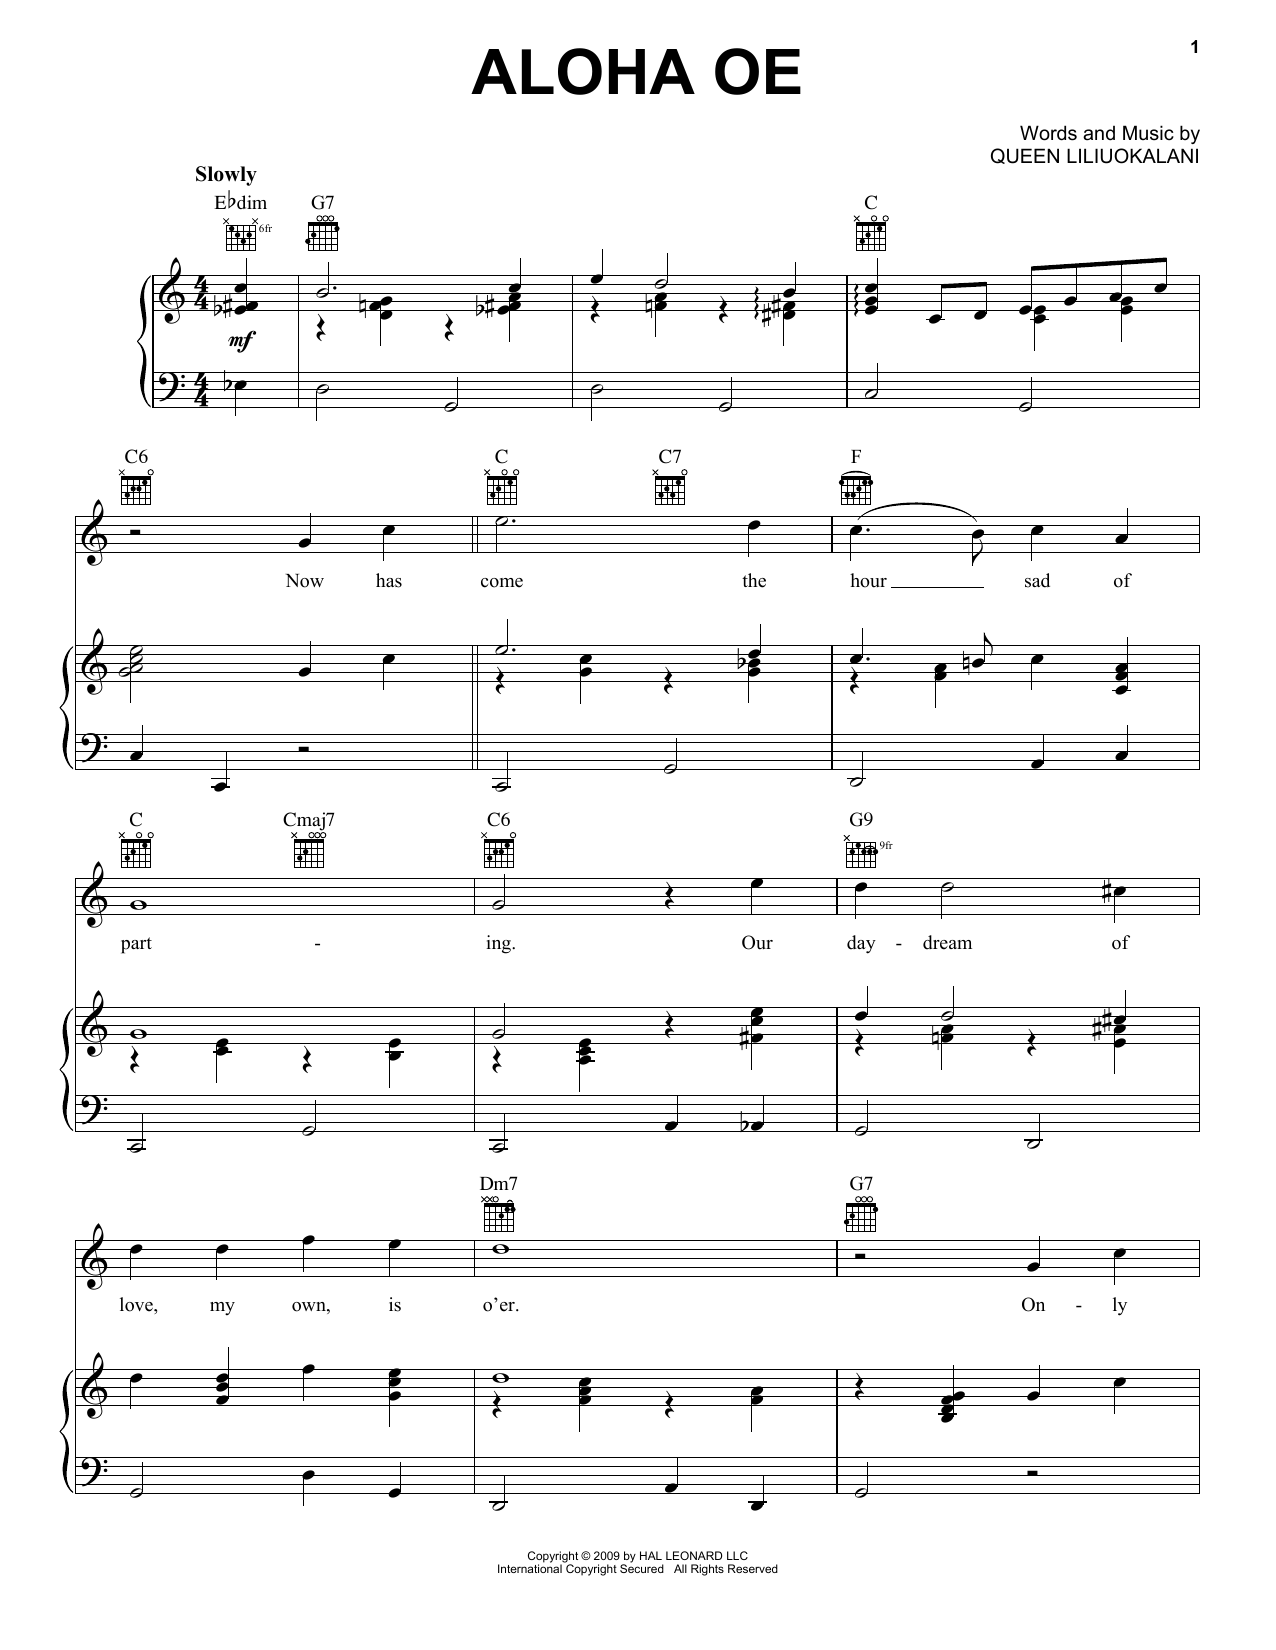 Queen Liliuokalani Aloha Oe sheet music notes and chords. Download Printable PDF.